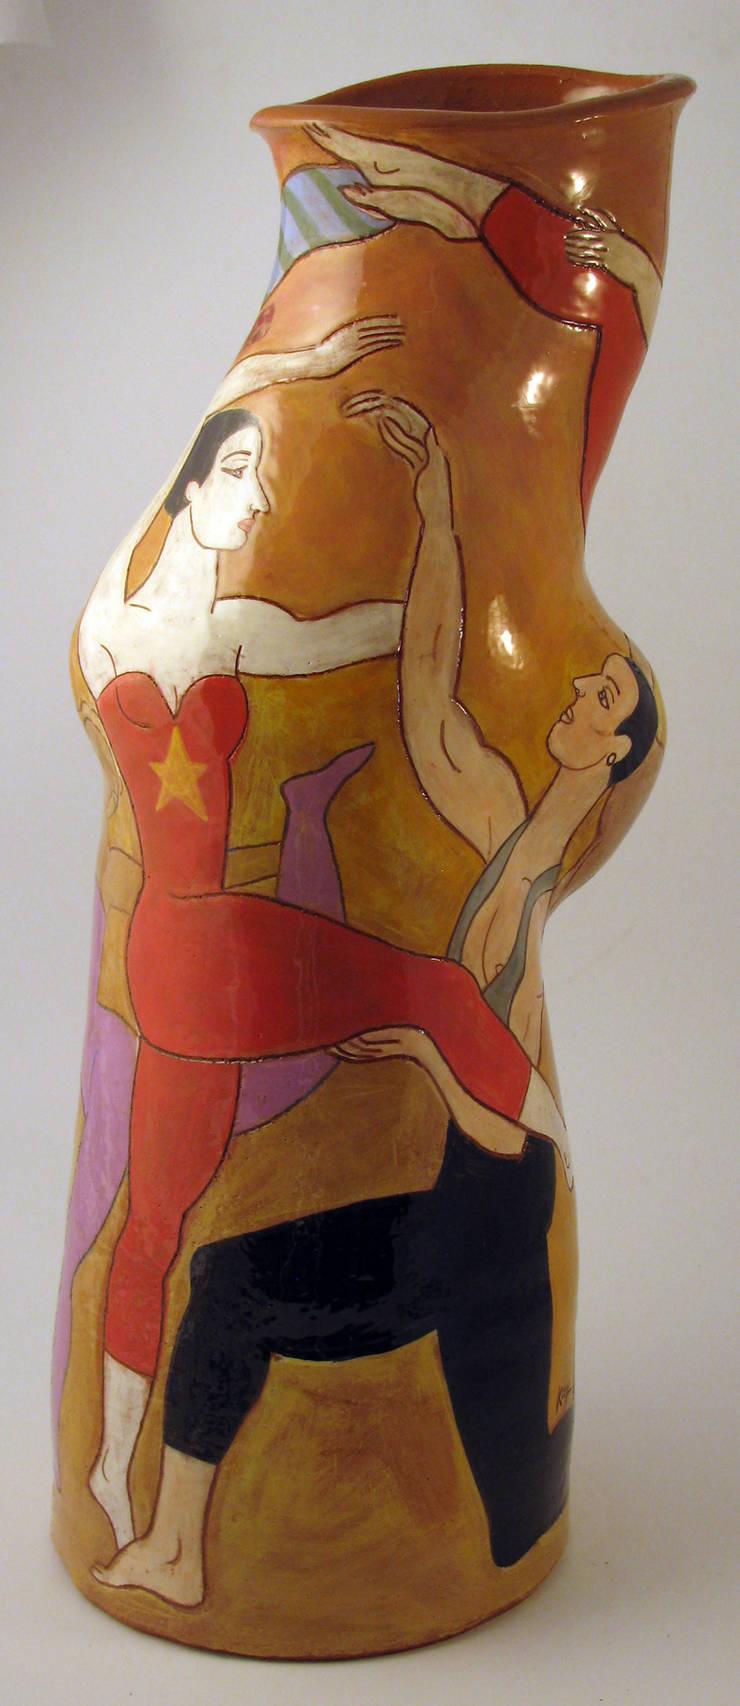 Acrobats:  Artwork by Michael Kay; Ceramic Artist